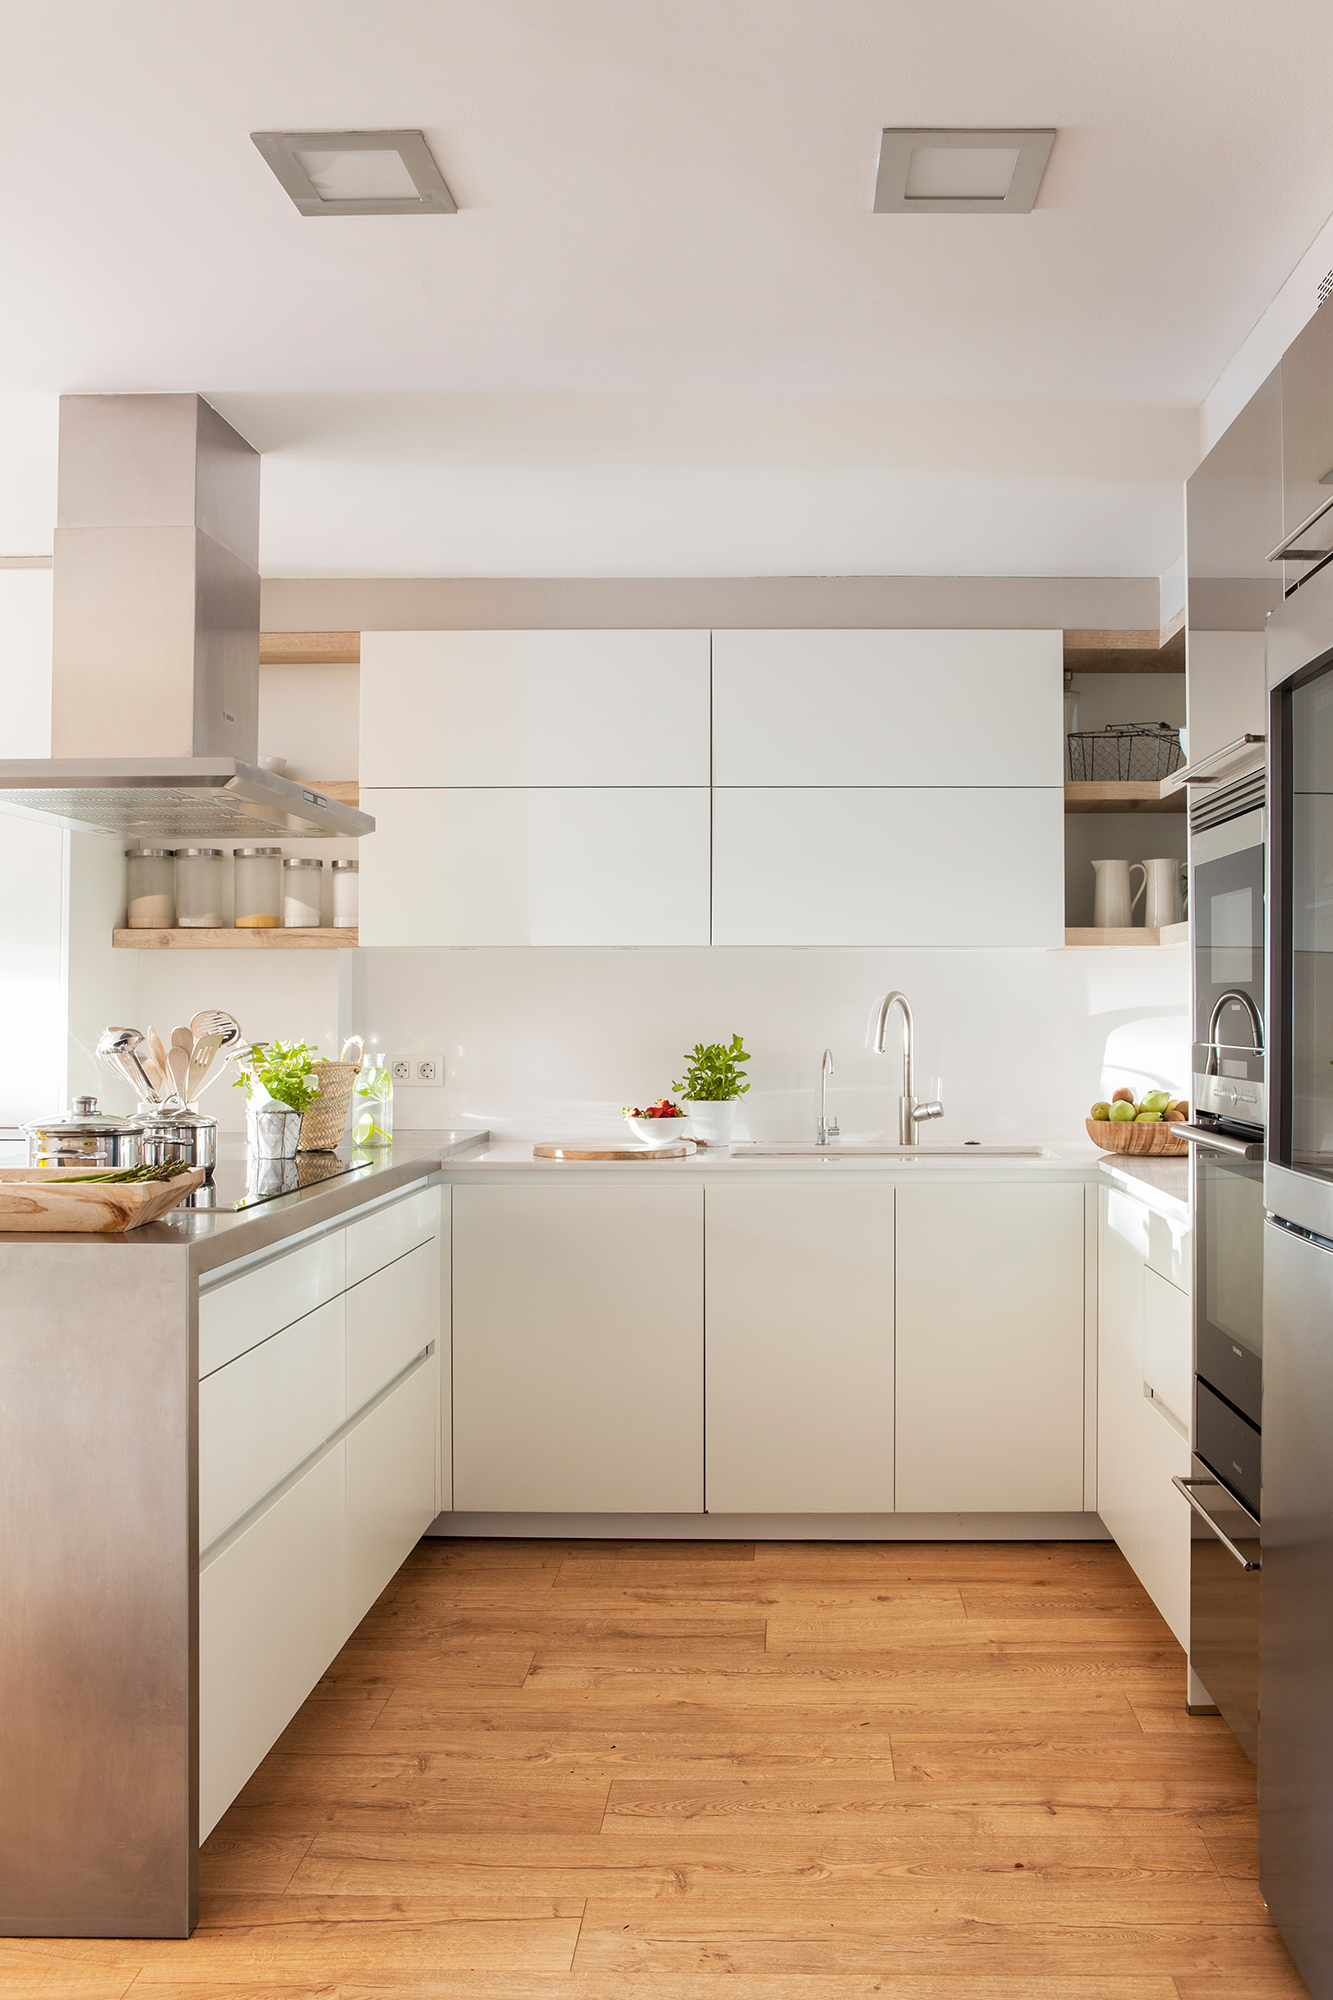 Cocinas muebles decoraci n dise o blancas o peque as for Muebles de cocina blancos